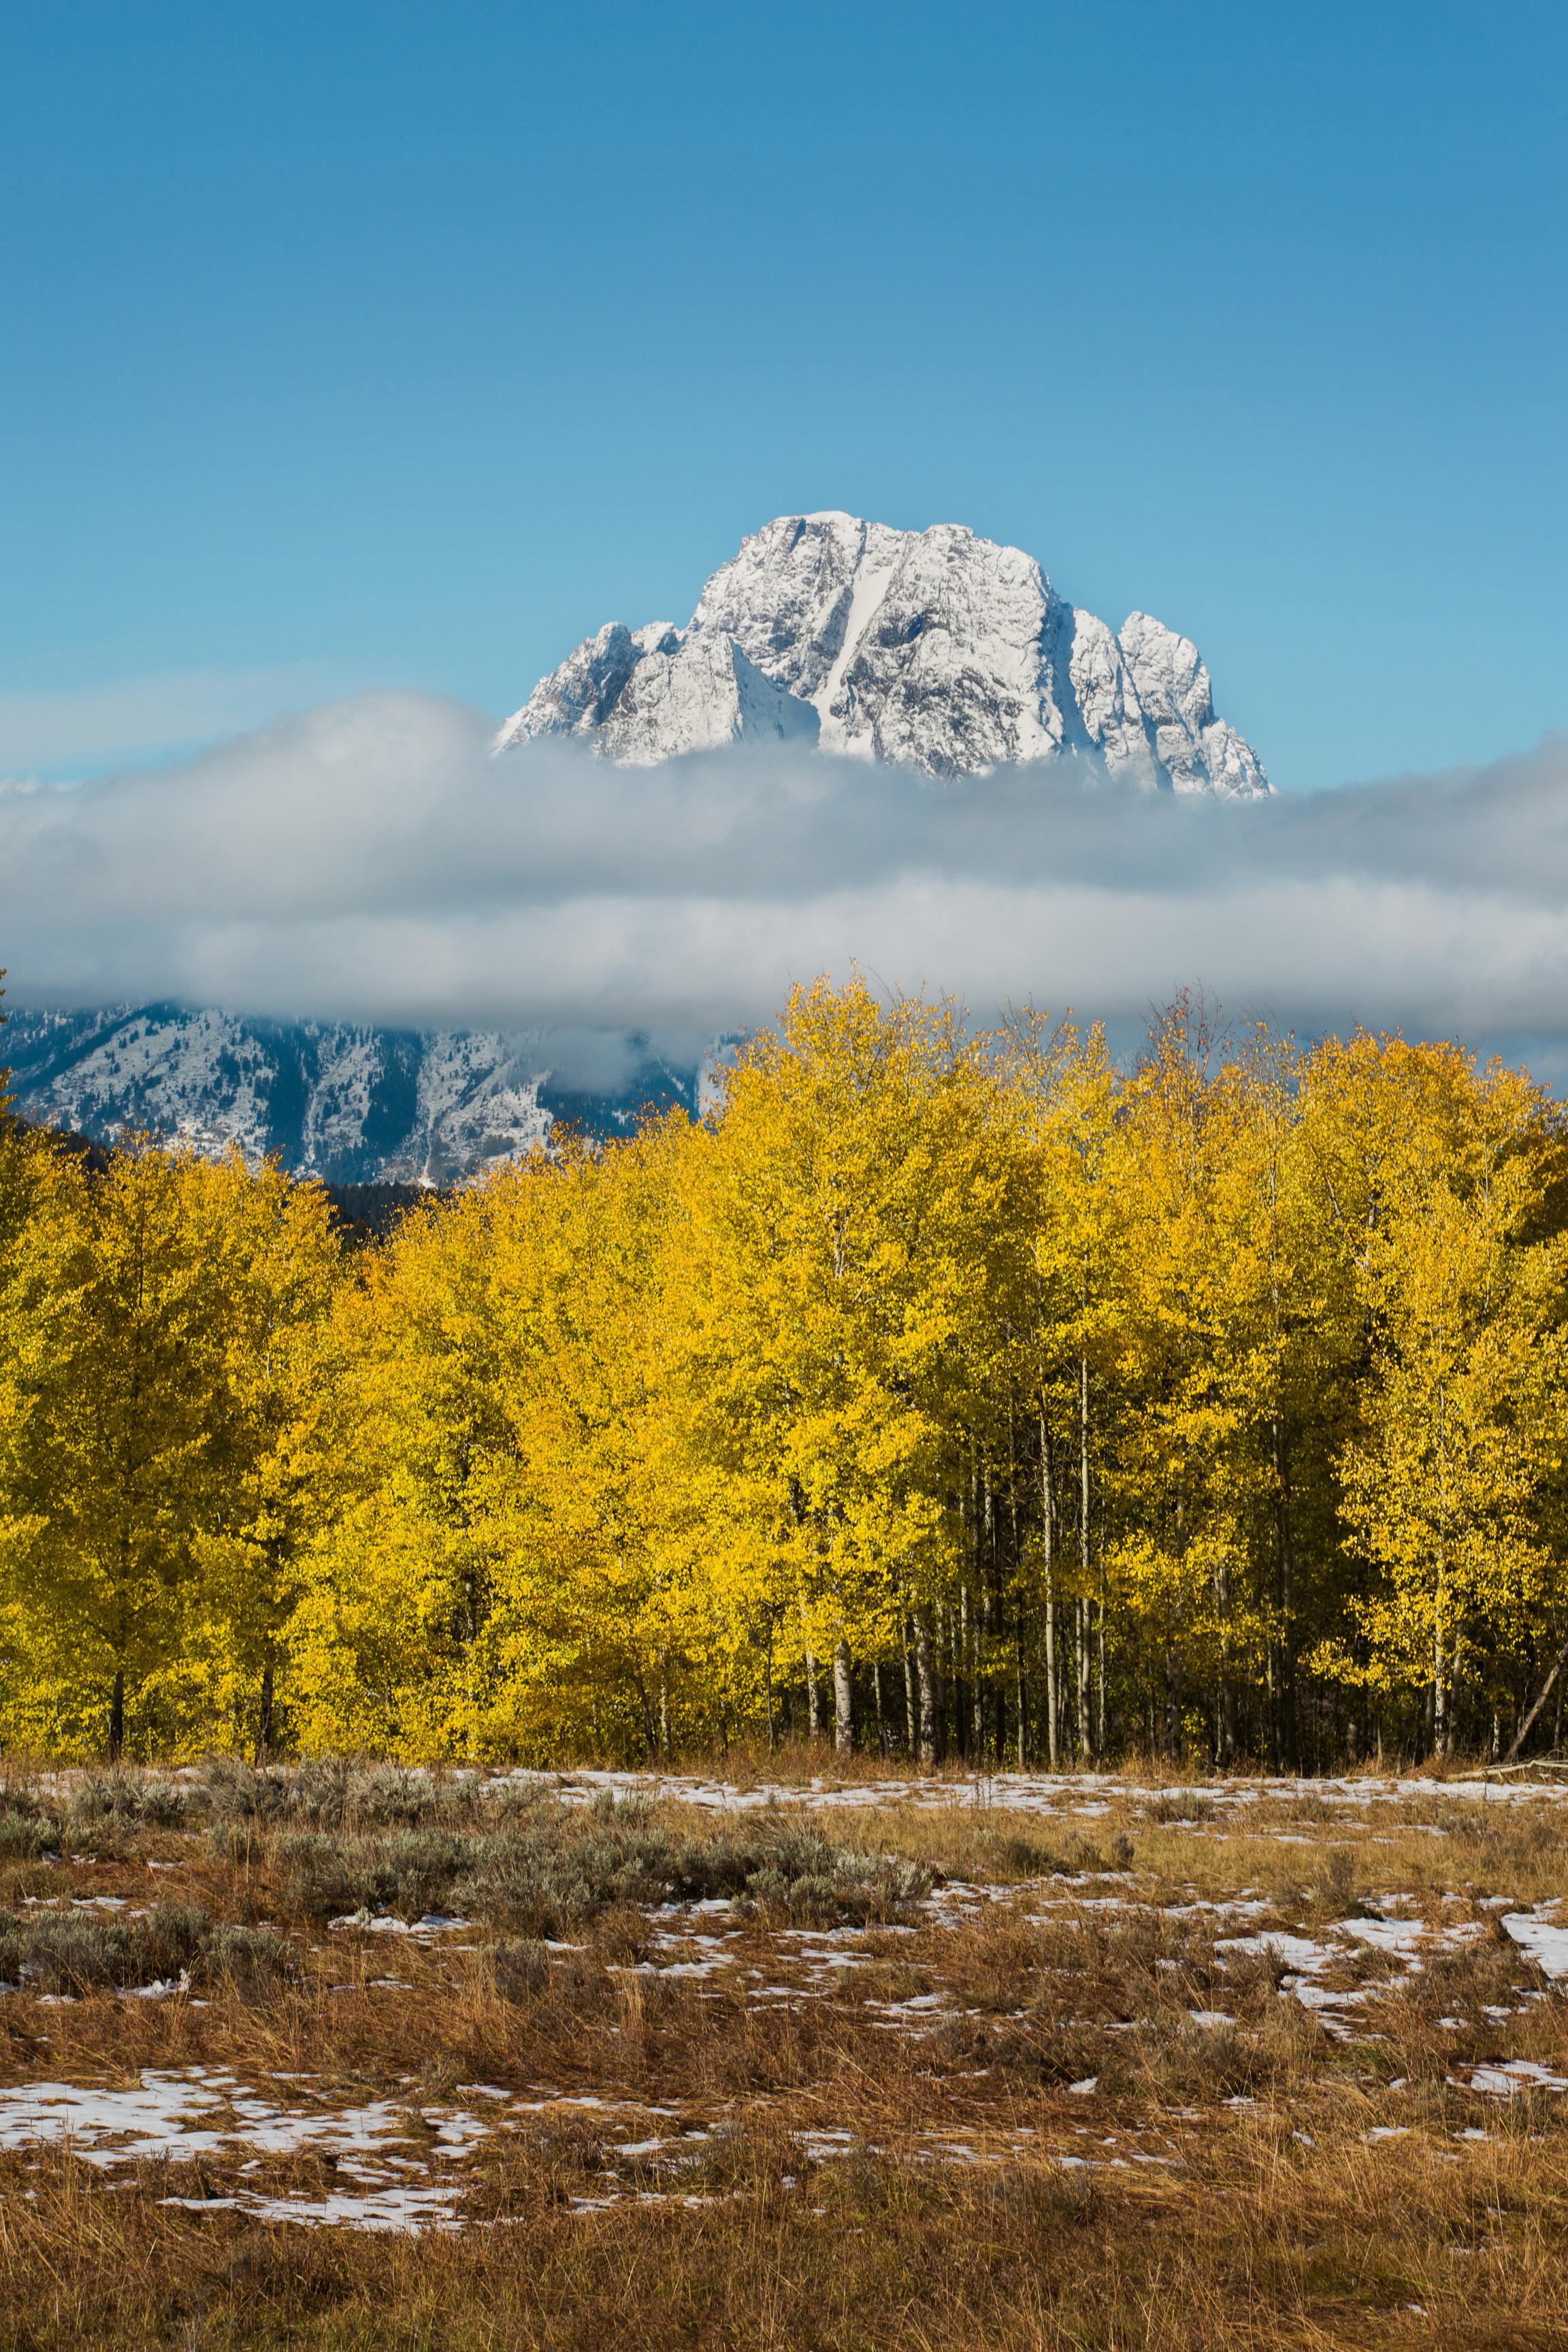 CindyGiovagnoli_outdoor_adventure_photography_Grand_Teton_Yellowstone_Glacier_National_Park_Montana_Wyoming_South_Dakota_Mount_Rushmore_Badlands-003.jpg